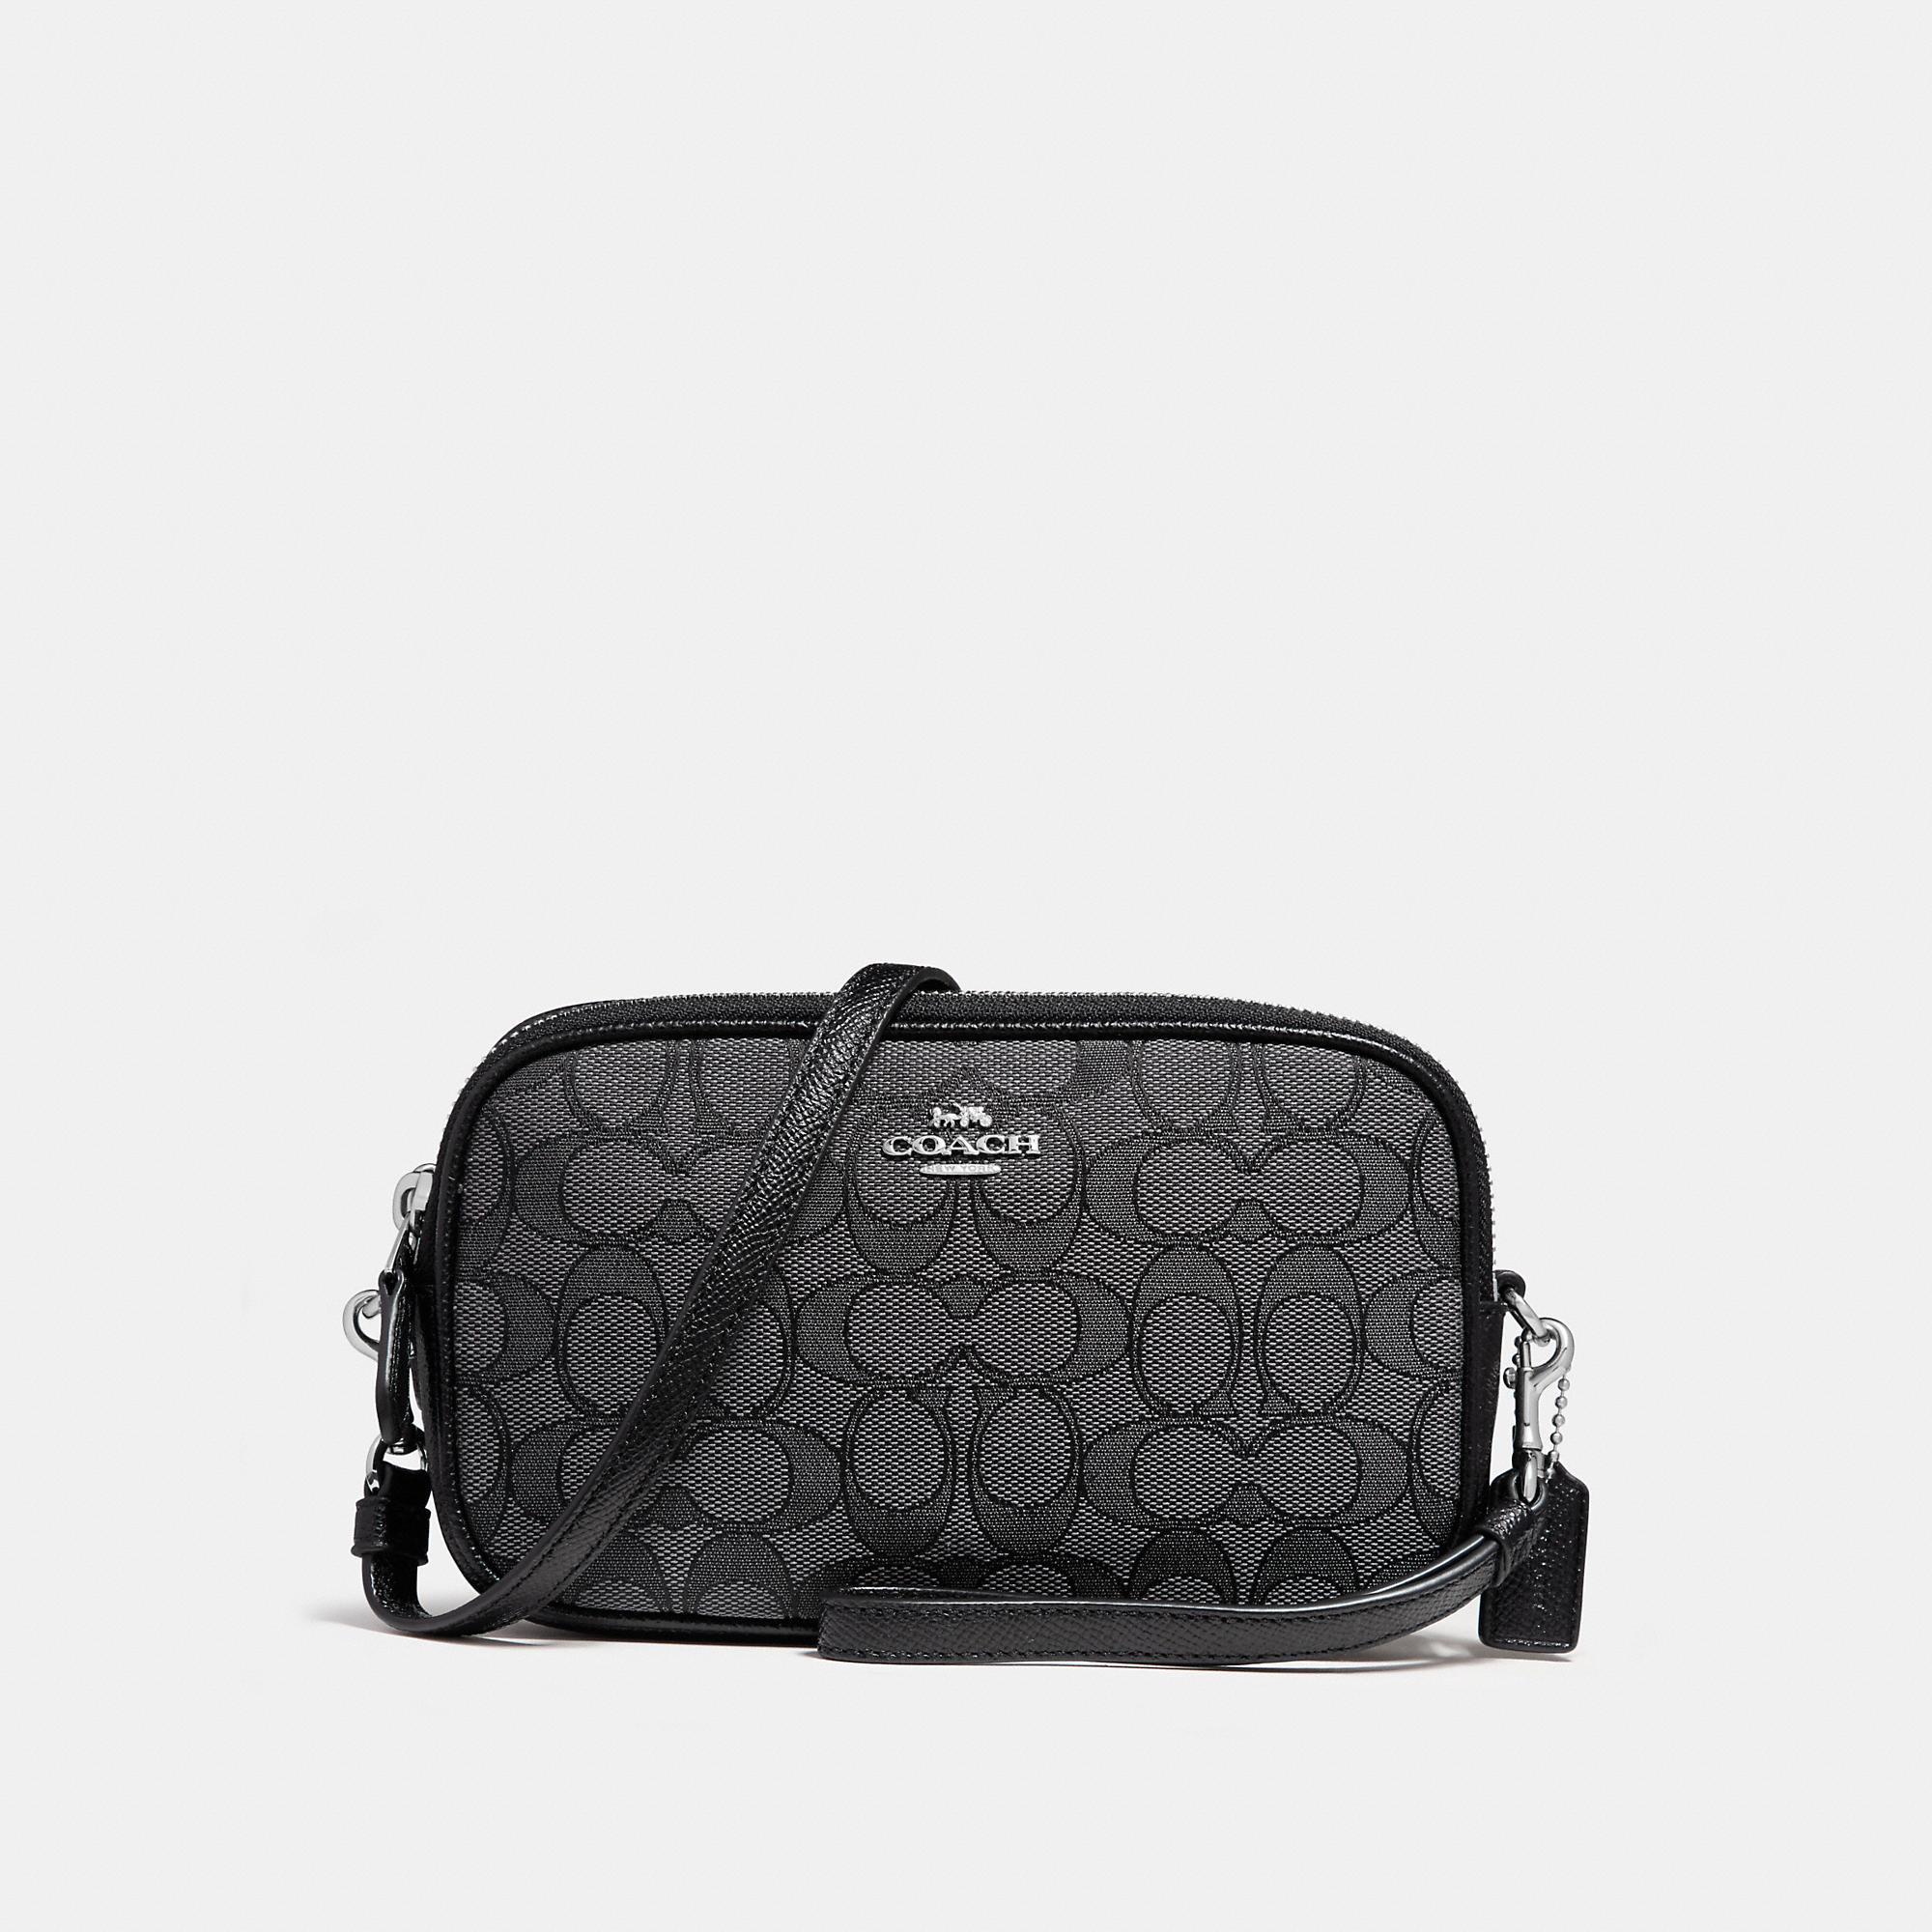 COACH Womens Boxed Small Wristlet Bag Signature Jacquard Black Smoke